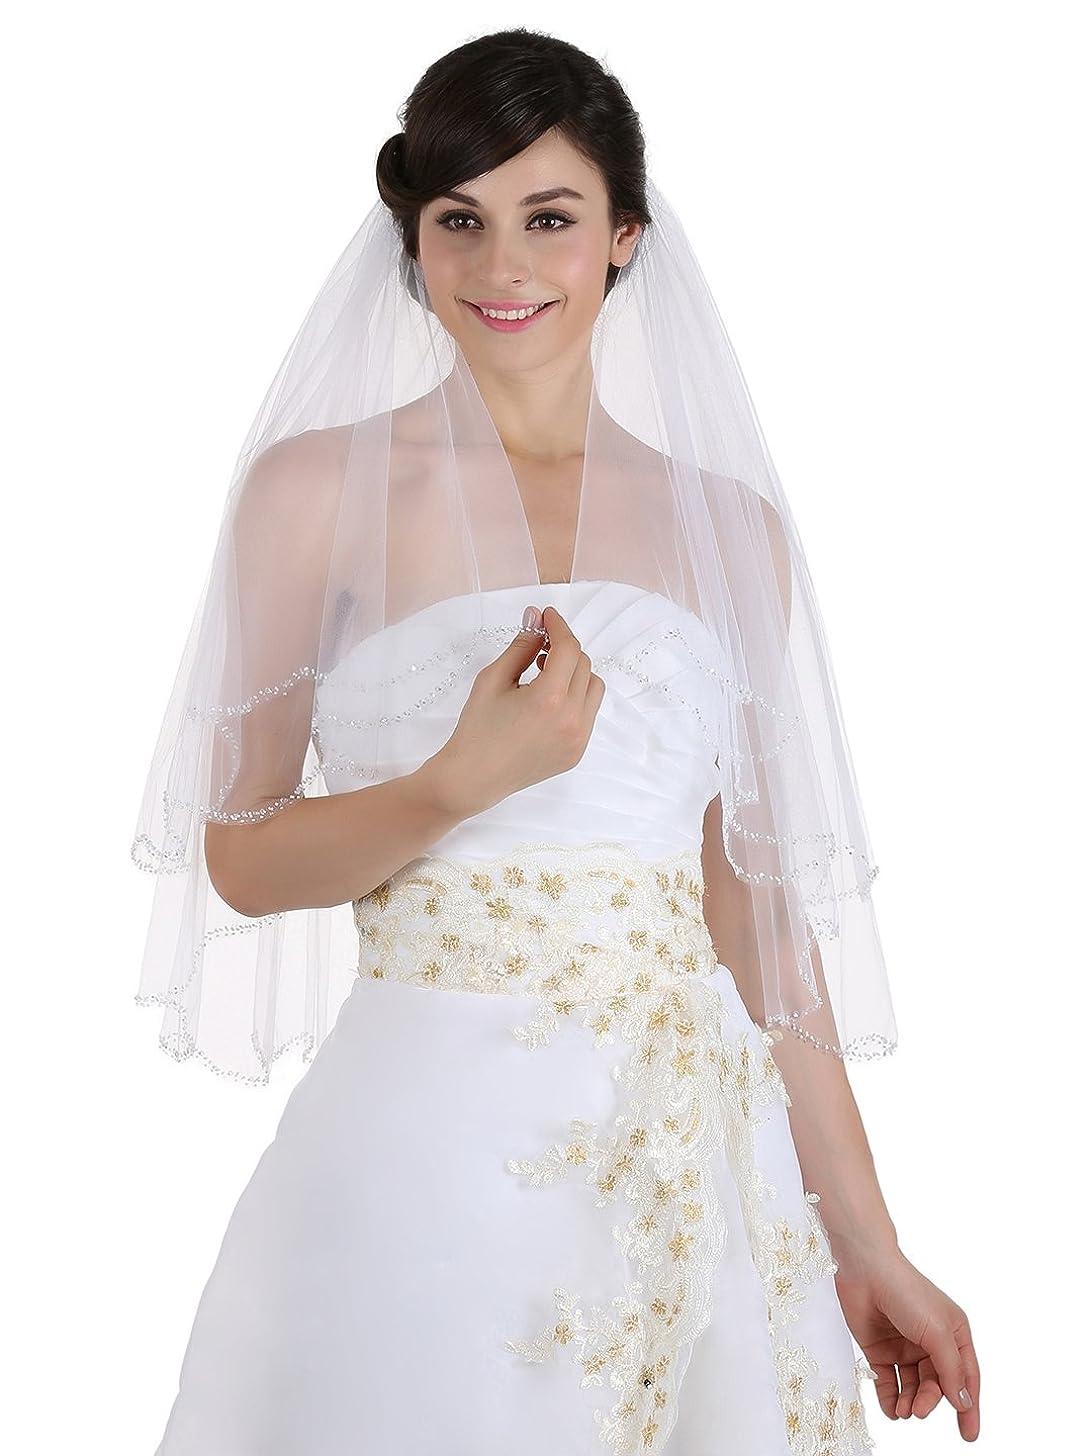 2T 2 Tier Beaded Scallop Edge Bridal Veil Elbow Length 30